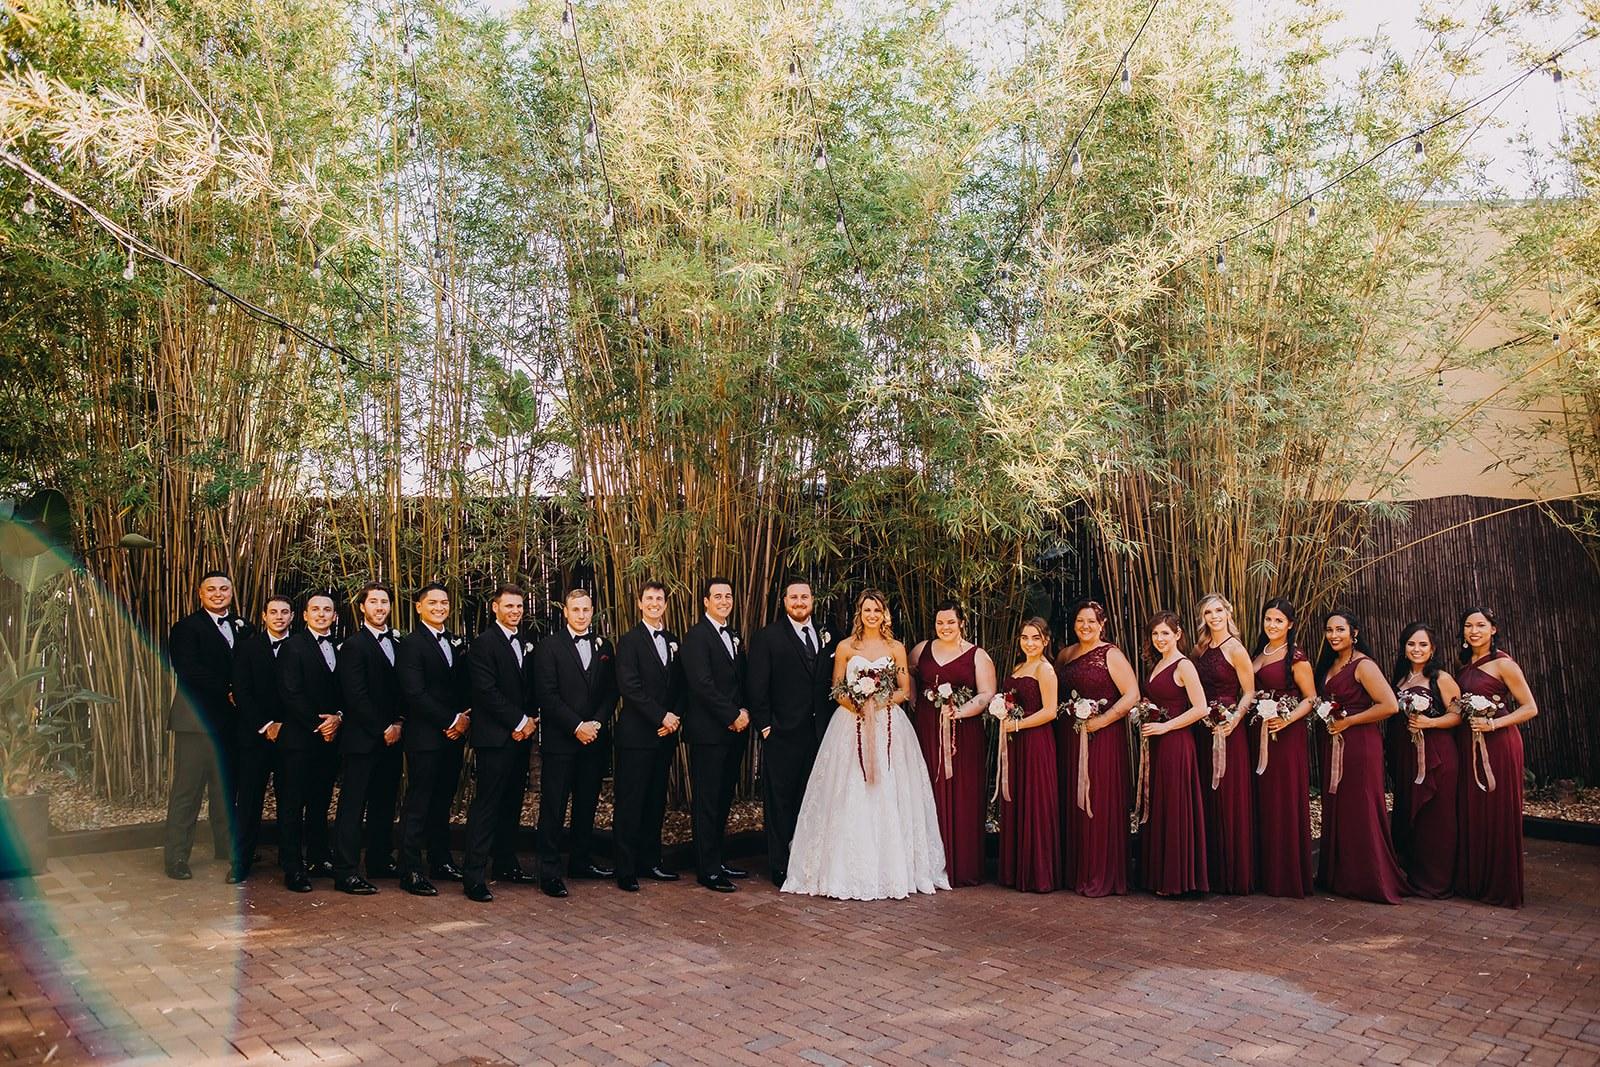 Beautiful Dark Red Maroon Wedding Party in Florida Bamboo Courtyard | Downtown St. Pete Unique Wedding Venue NOVA 535